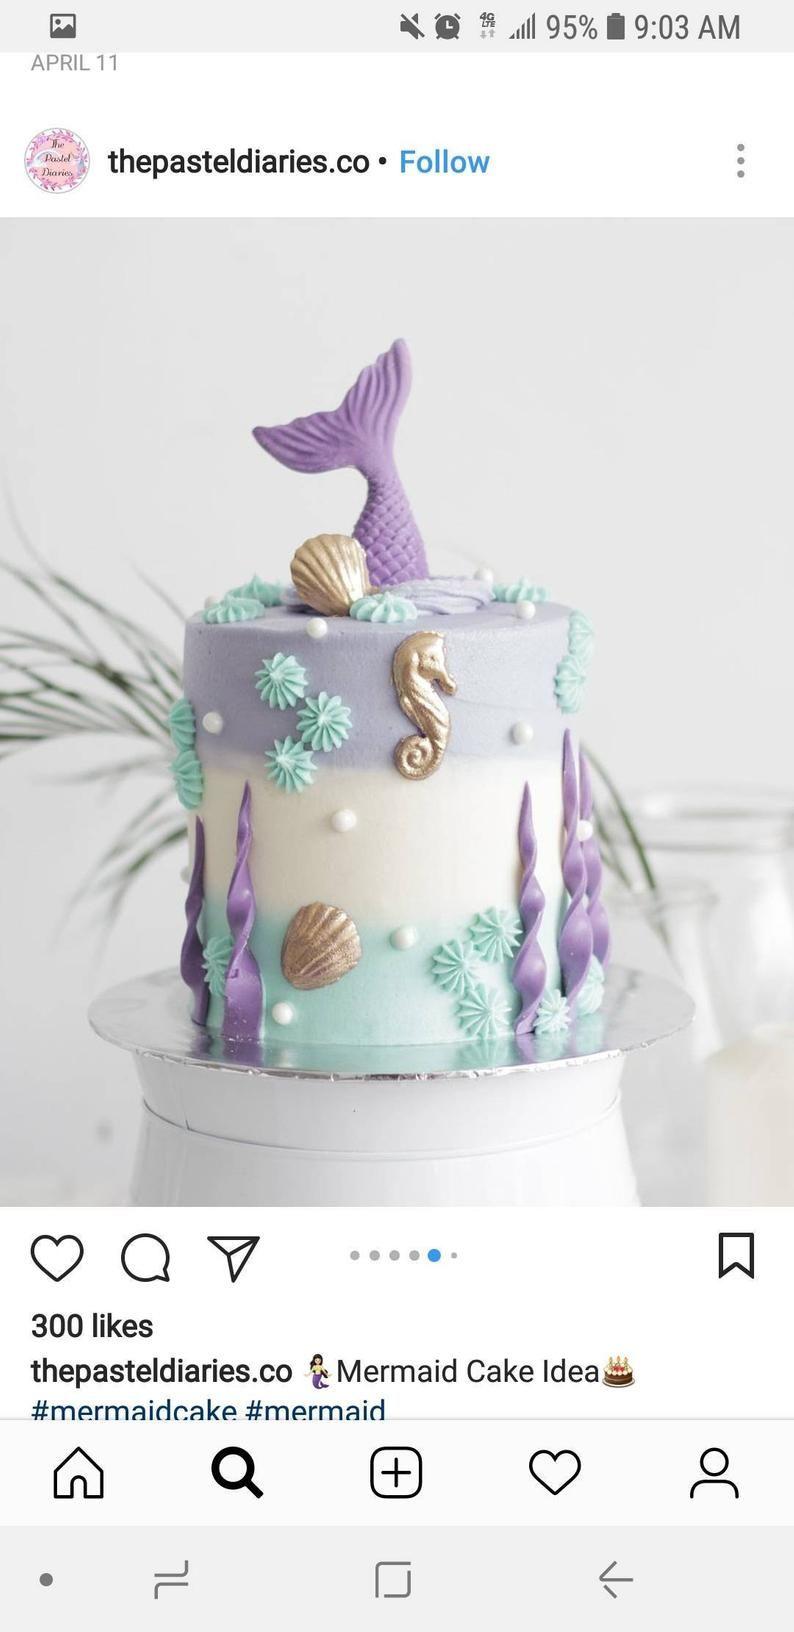 mermaid cake decorations edible